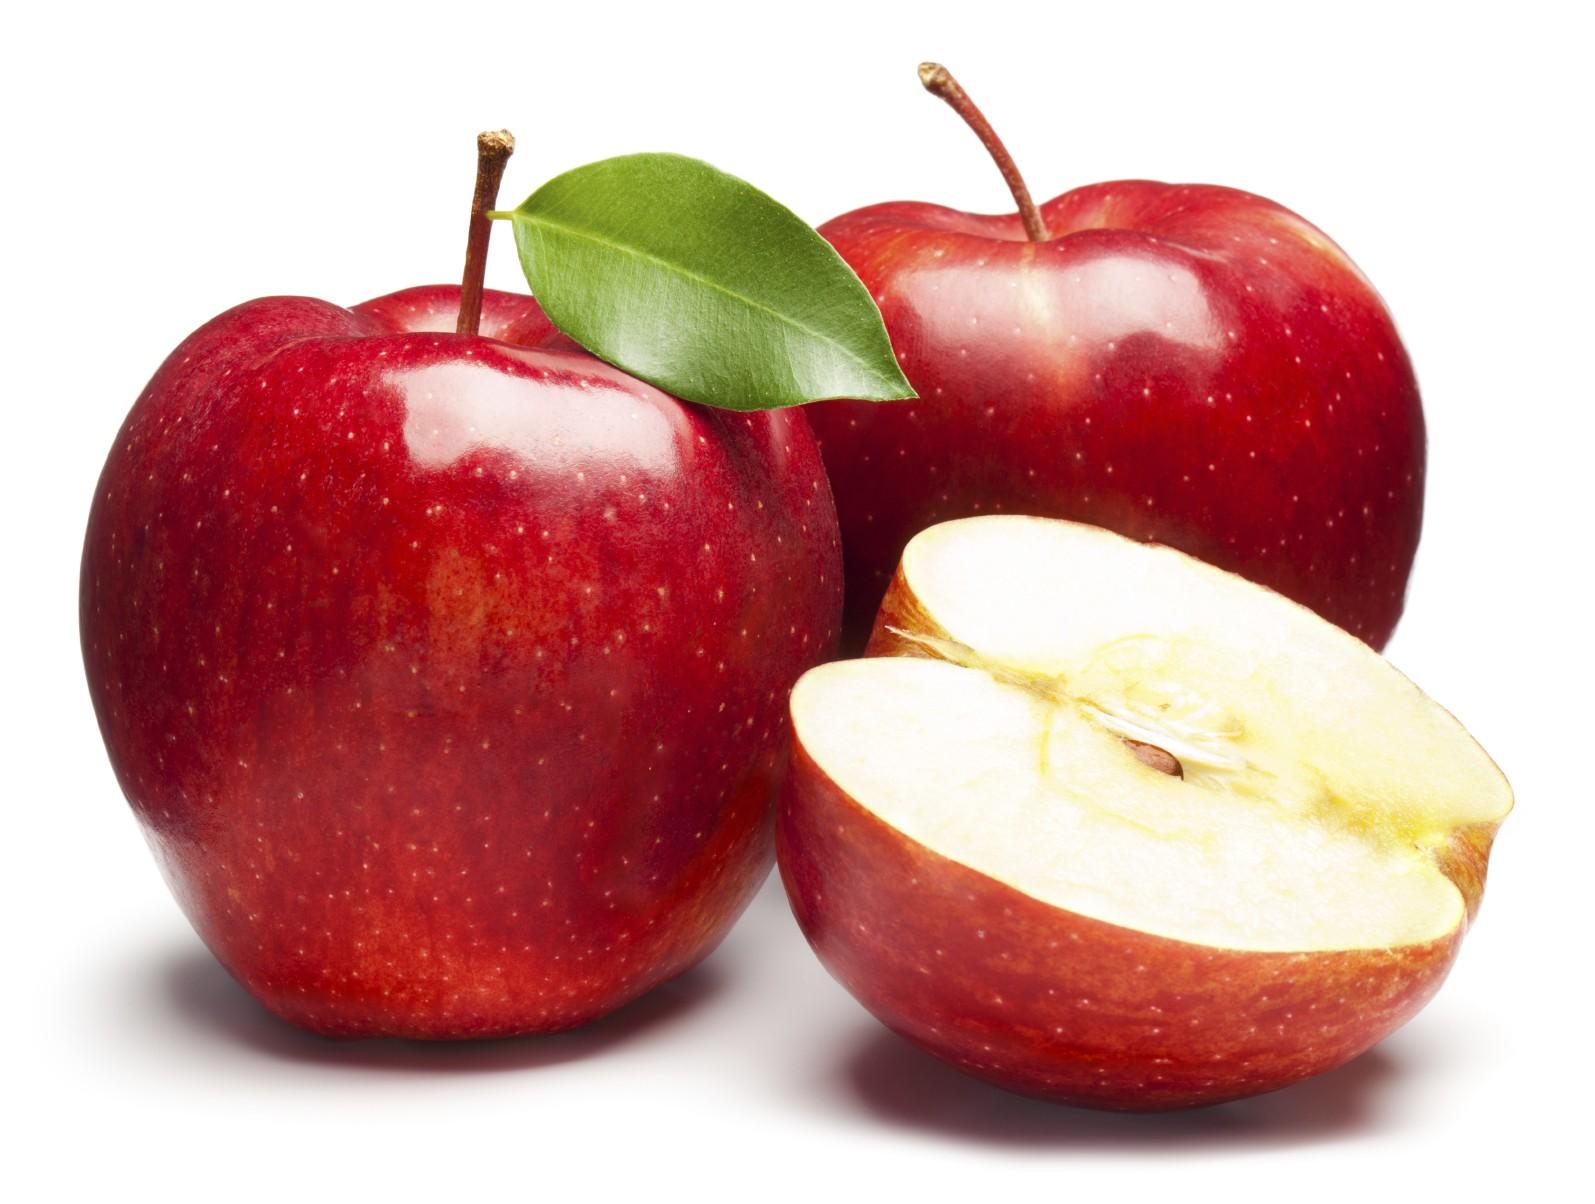 Filename: Apple-Fruit-13.jpg - Apple Fruit PNG